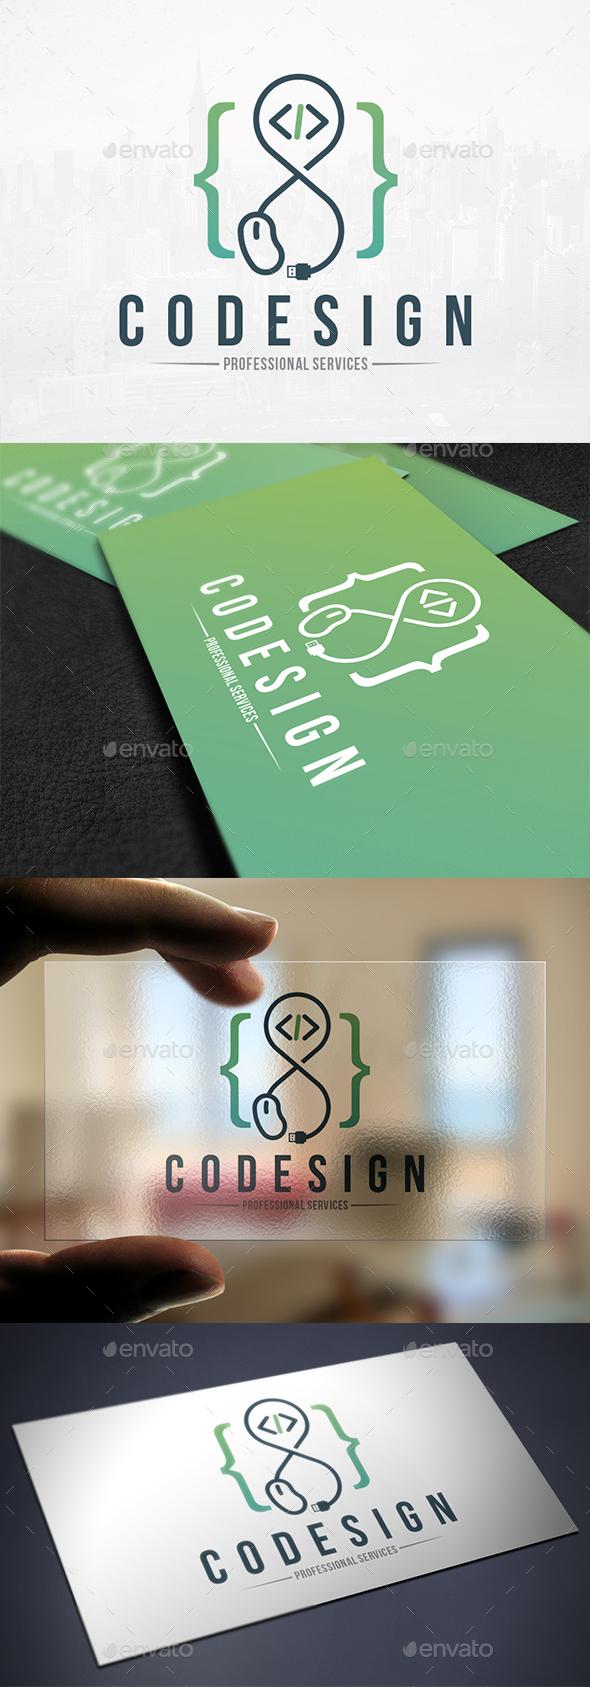 Infinity Code Design Logo